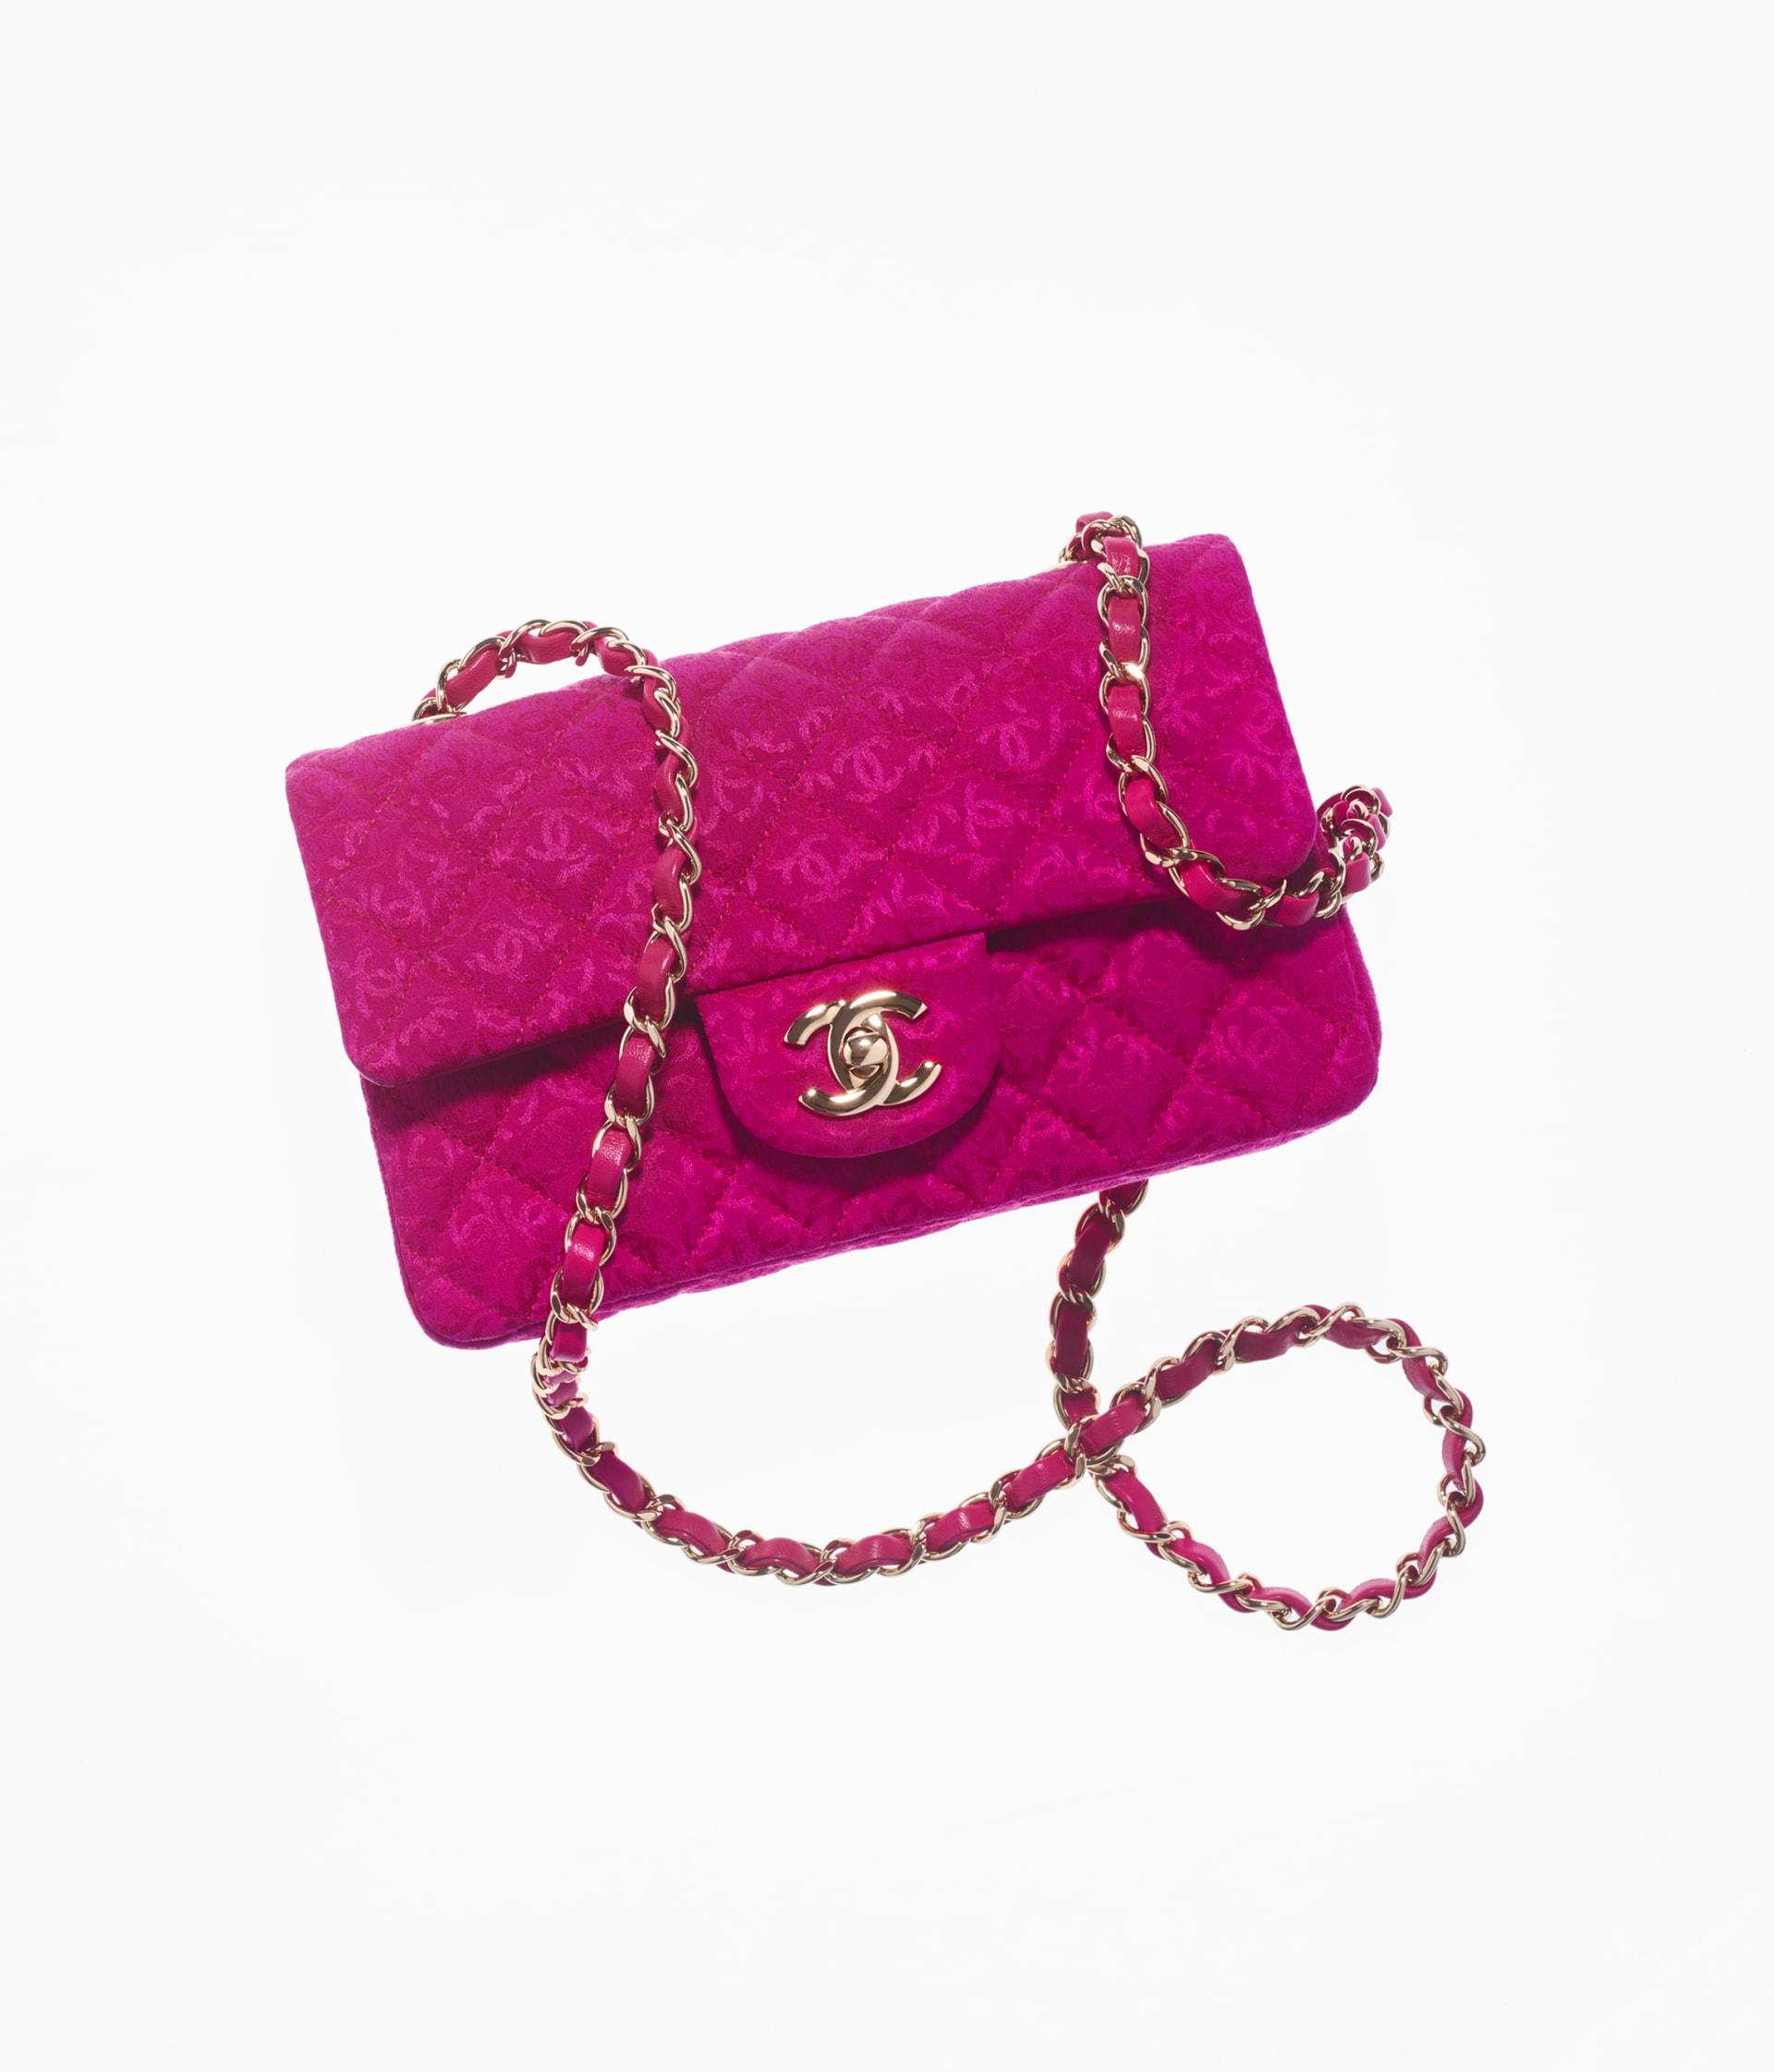 image 1 - Bolsa Mini - Silk Jacquard & Gold-Tone Metal - Rosa Escuro